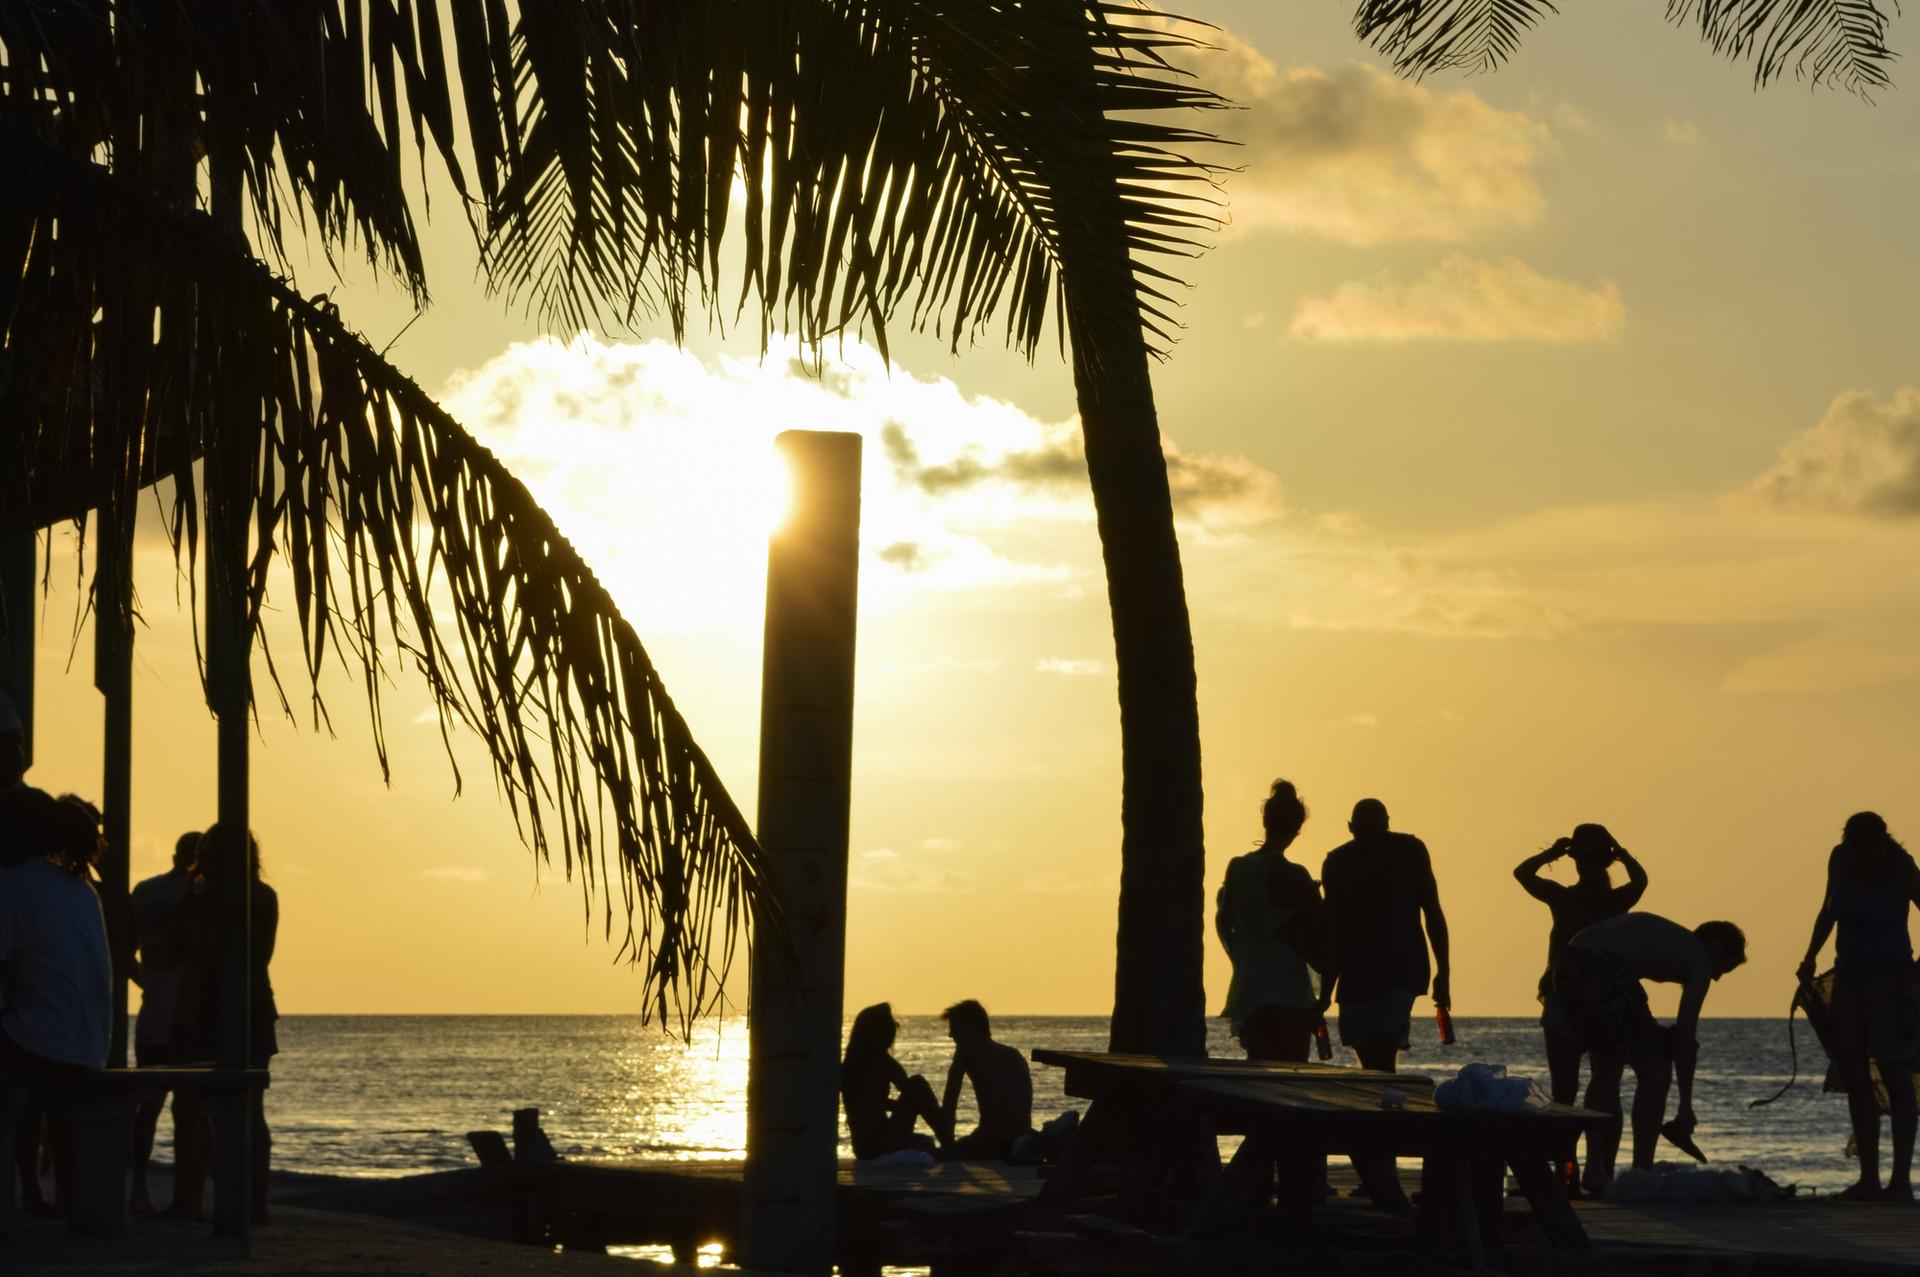 Split, Caye Caulker / Belize · 2014